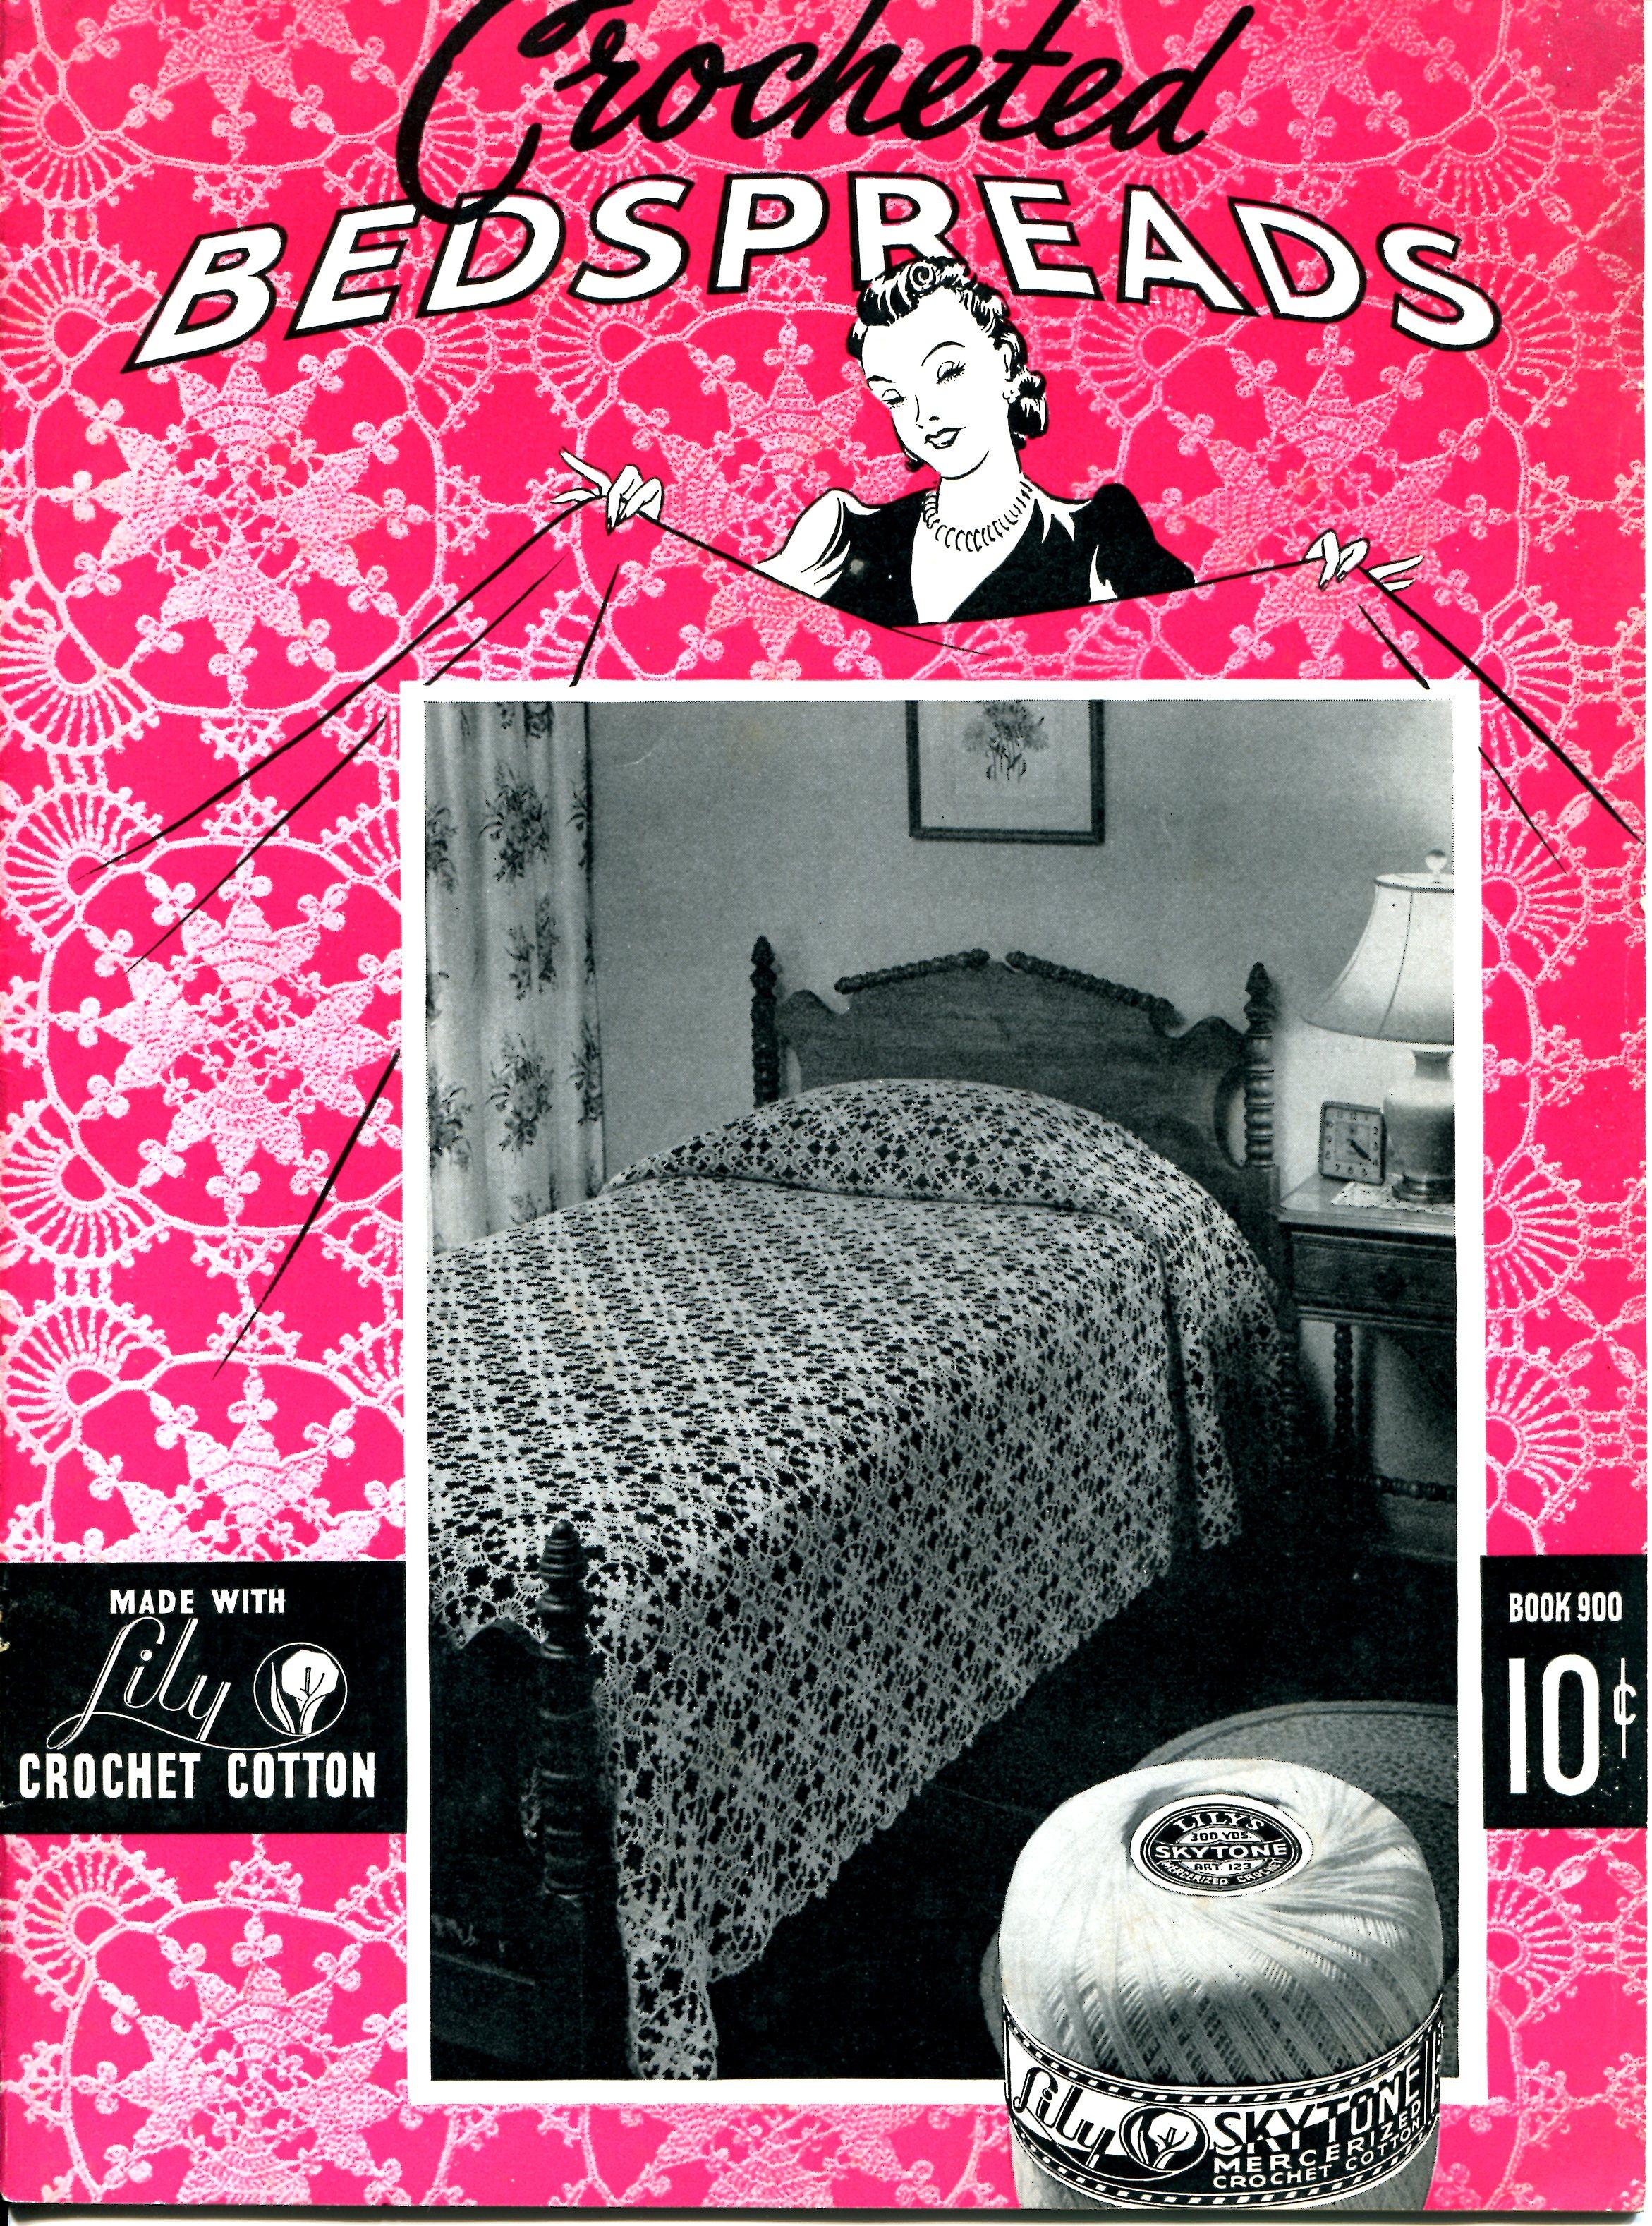 Vintage crochet pattern lace valentine bedspread vintage crafts lace valentine bedspread crochet pattern bankloansurffo Choice Image